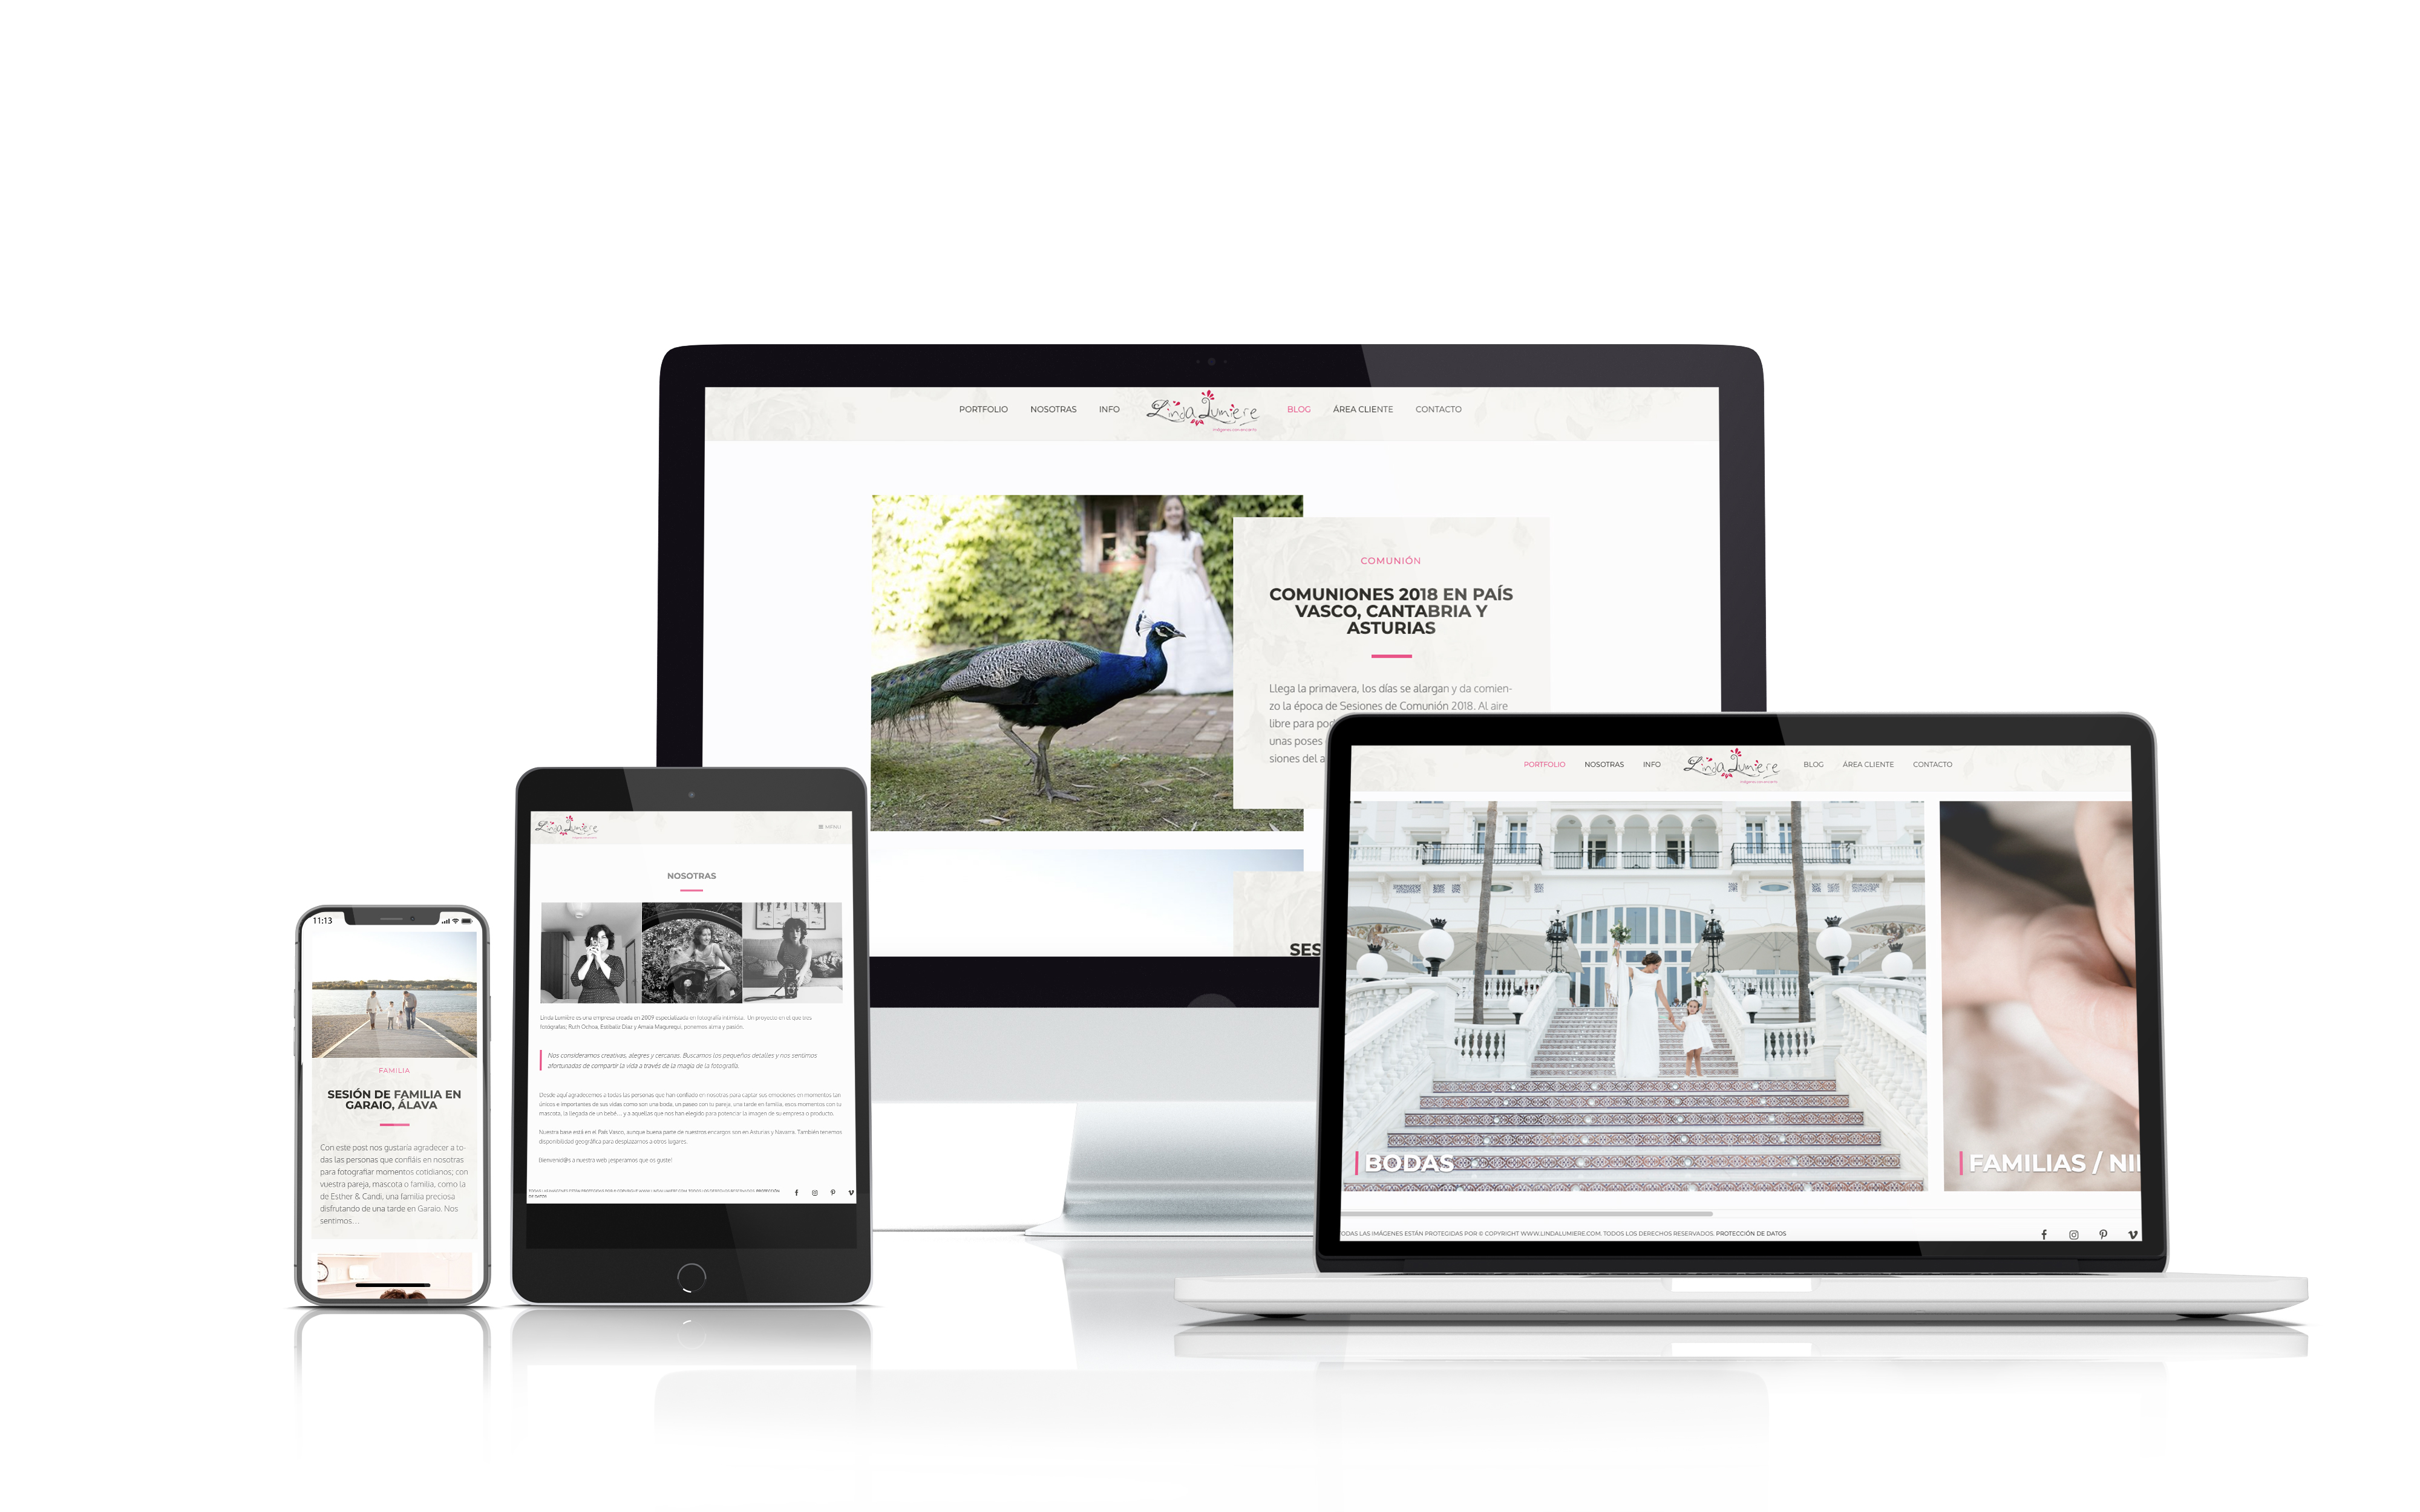 lindalumiere-mac-webs-para-fotografos